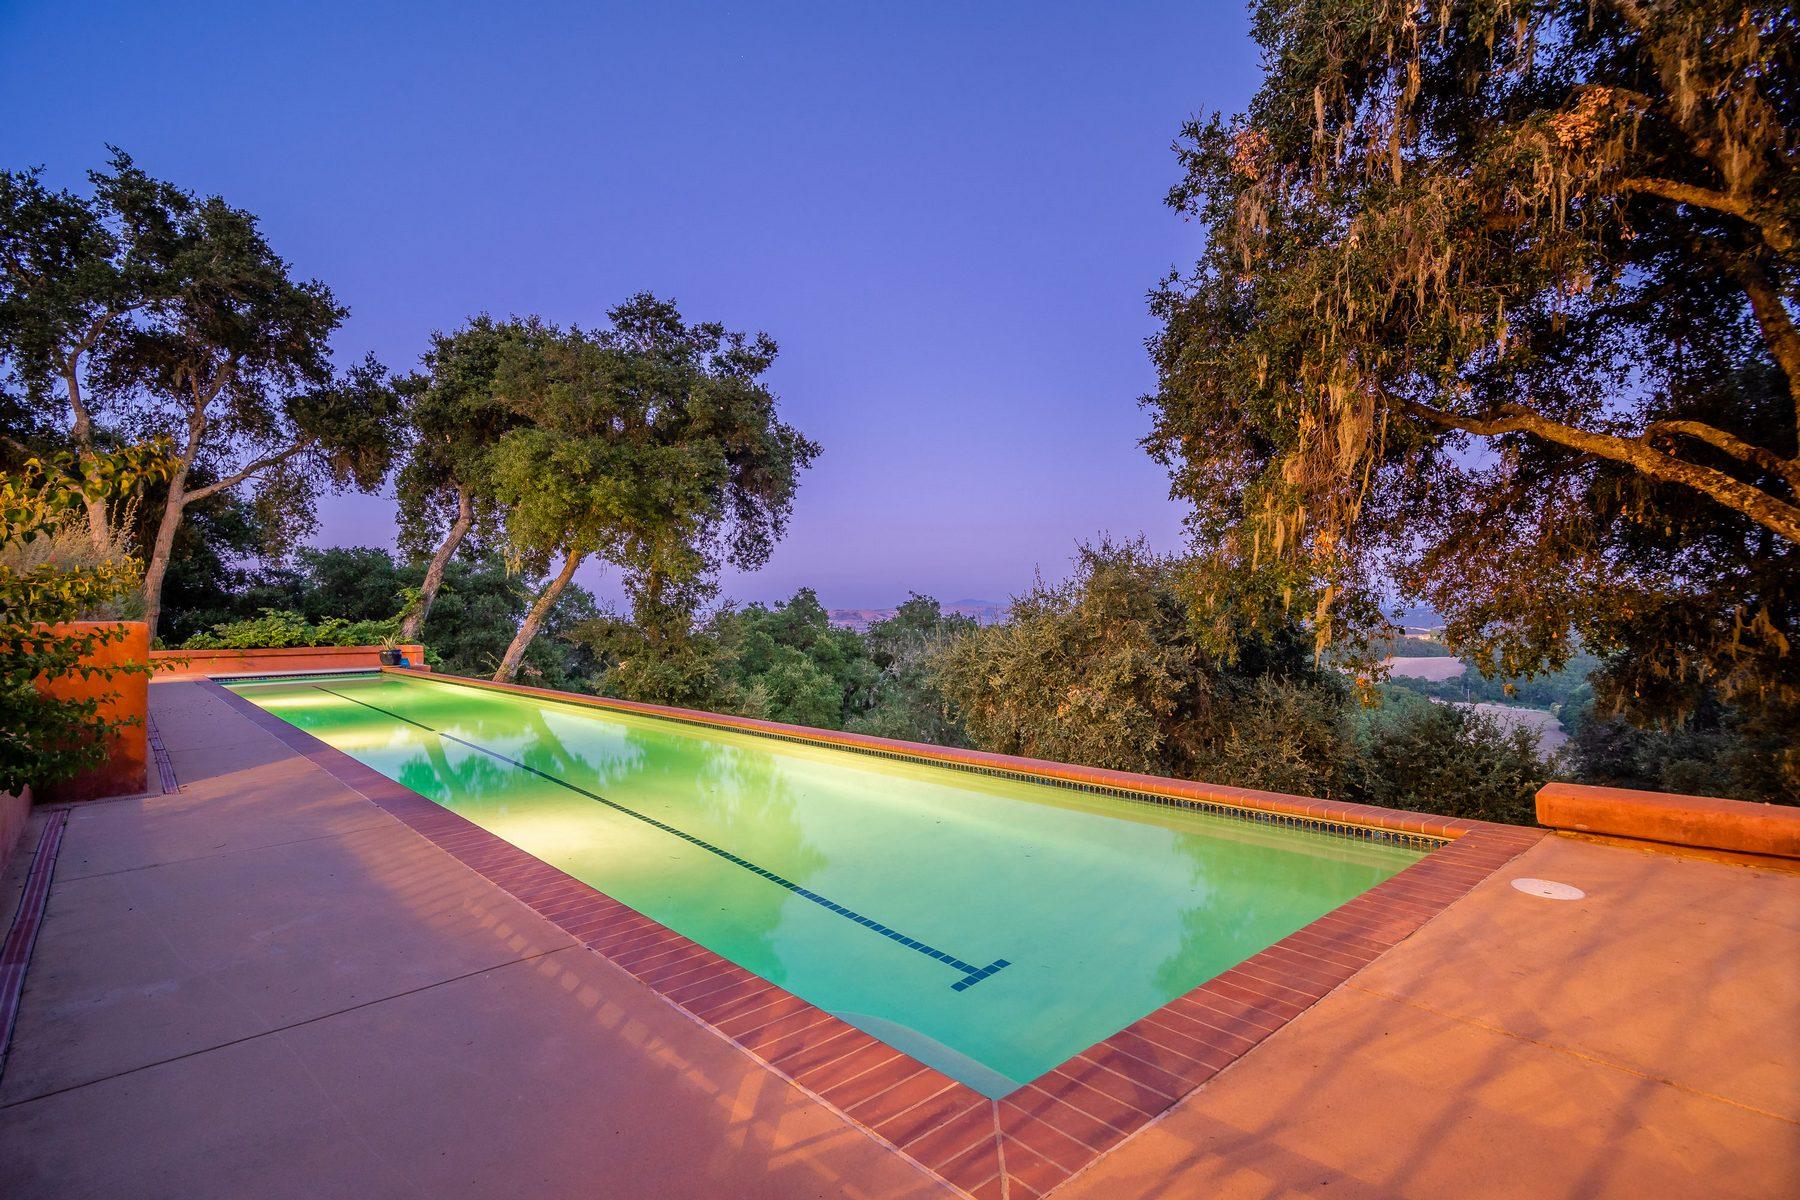 Single Family Homes for Sale at Spanish-style Villa & Vineyard on 30+/- Acres 3432 Las Tablas Wiliow Creek Paso Robles, California 93446 United States